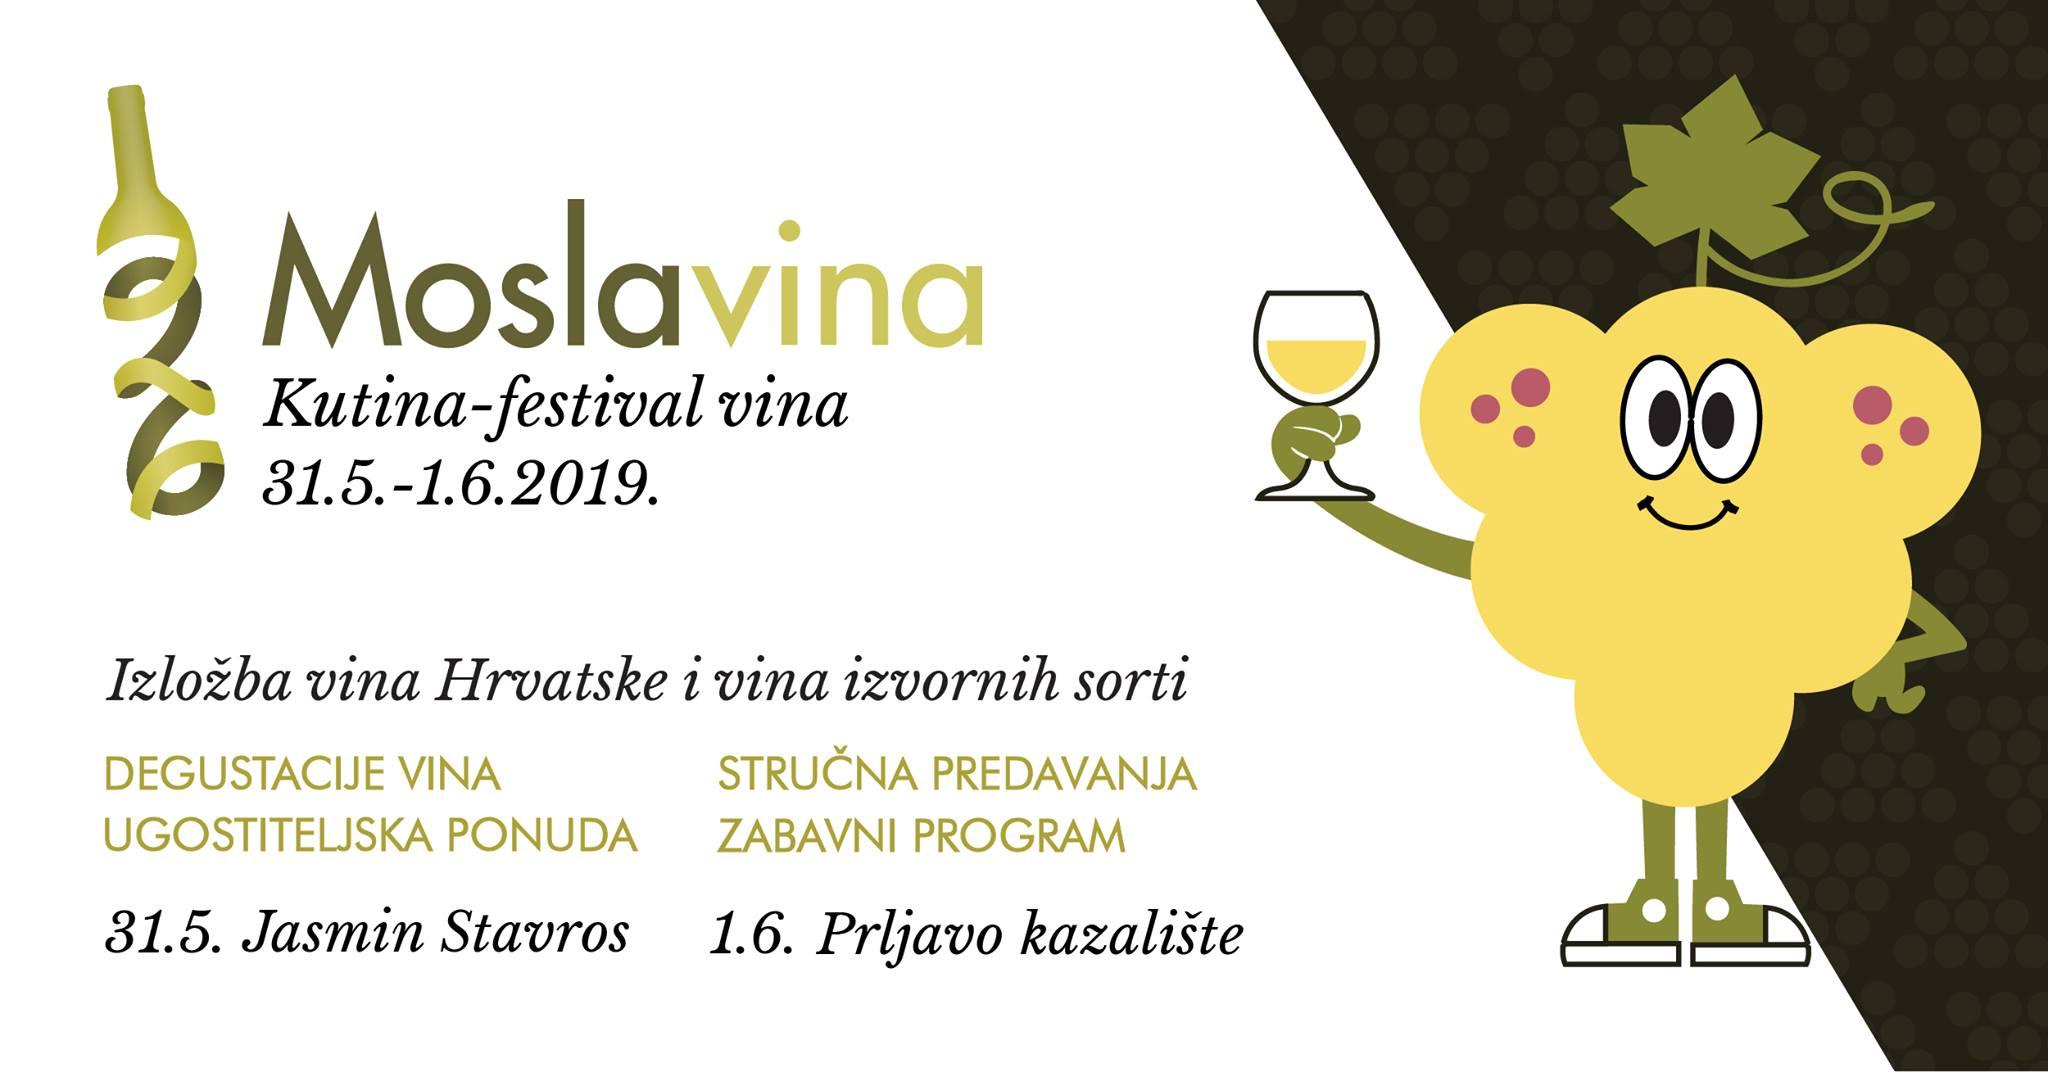 MoslaVina Kutina 2019. – festival vina